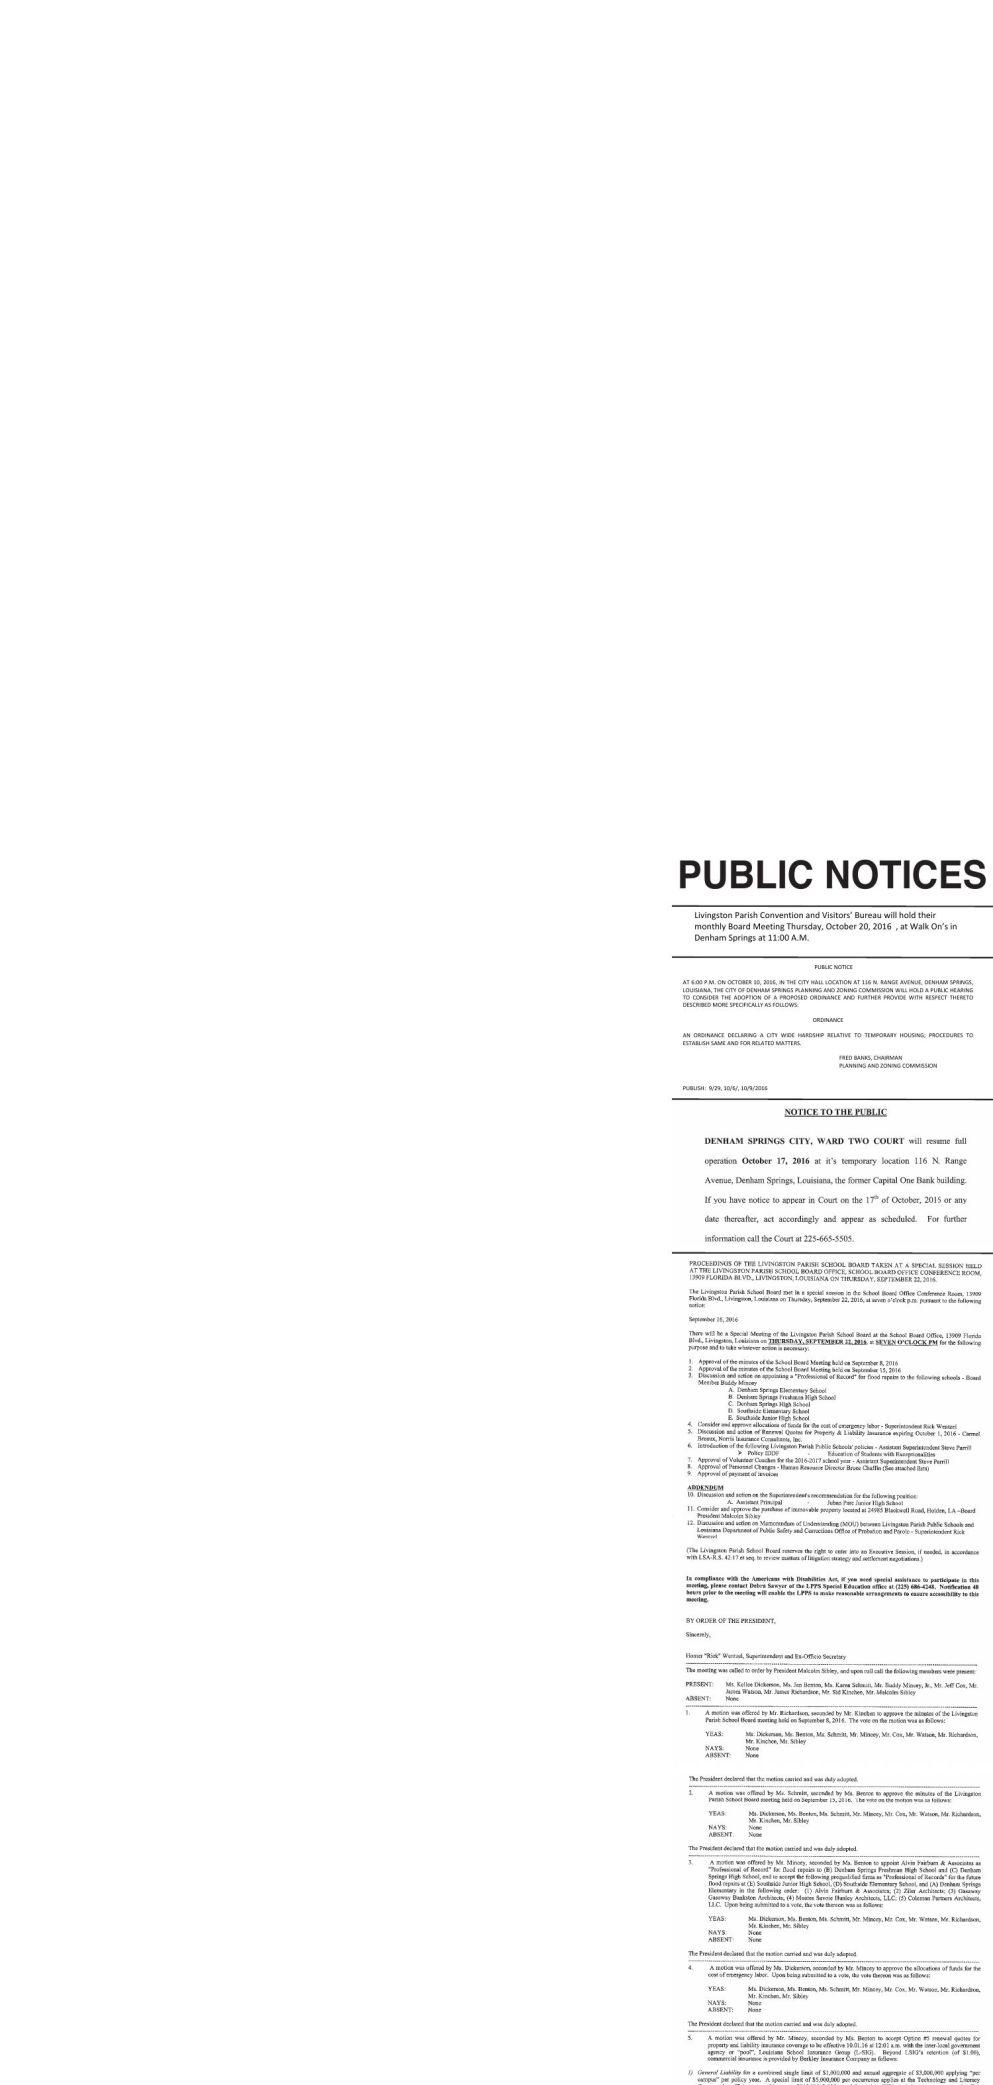 Public Notices published October 13, 2016